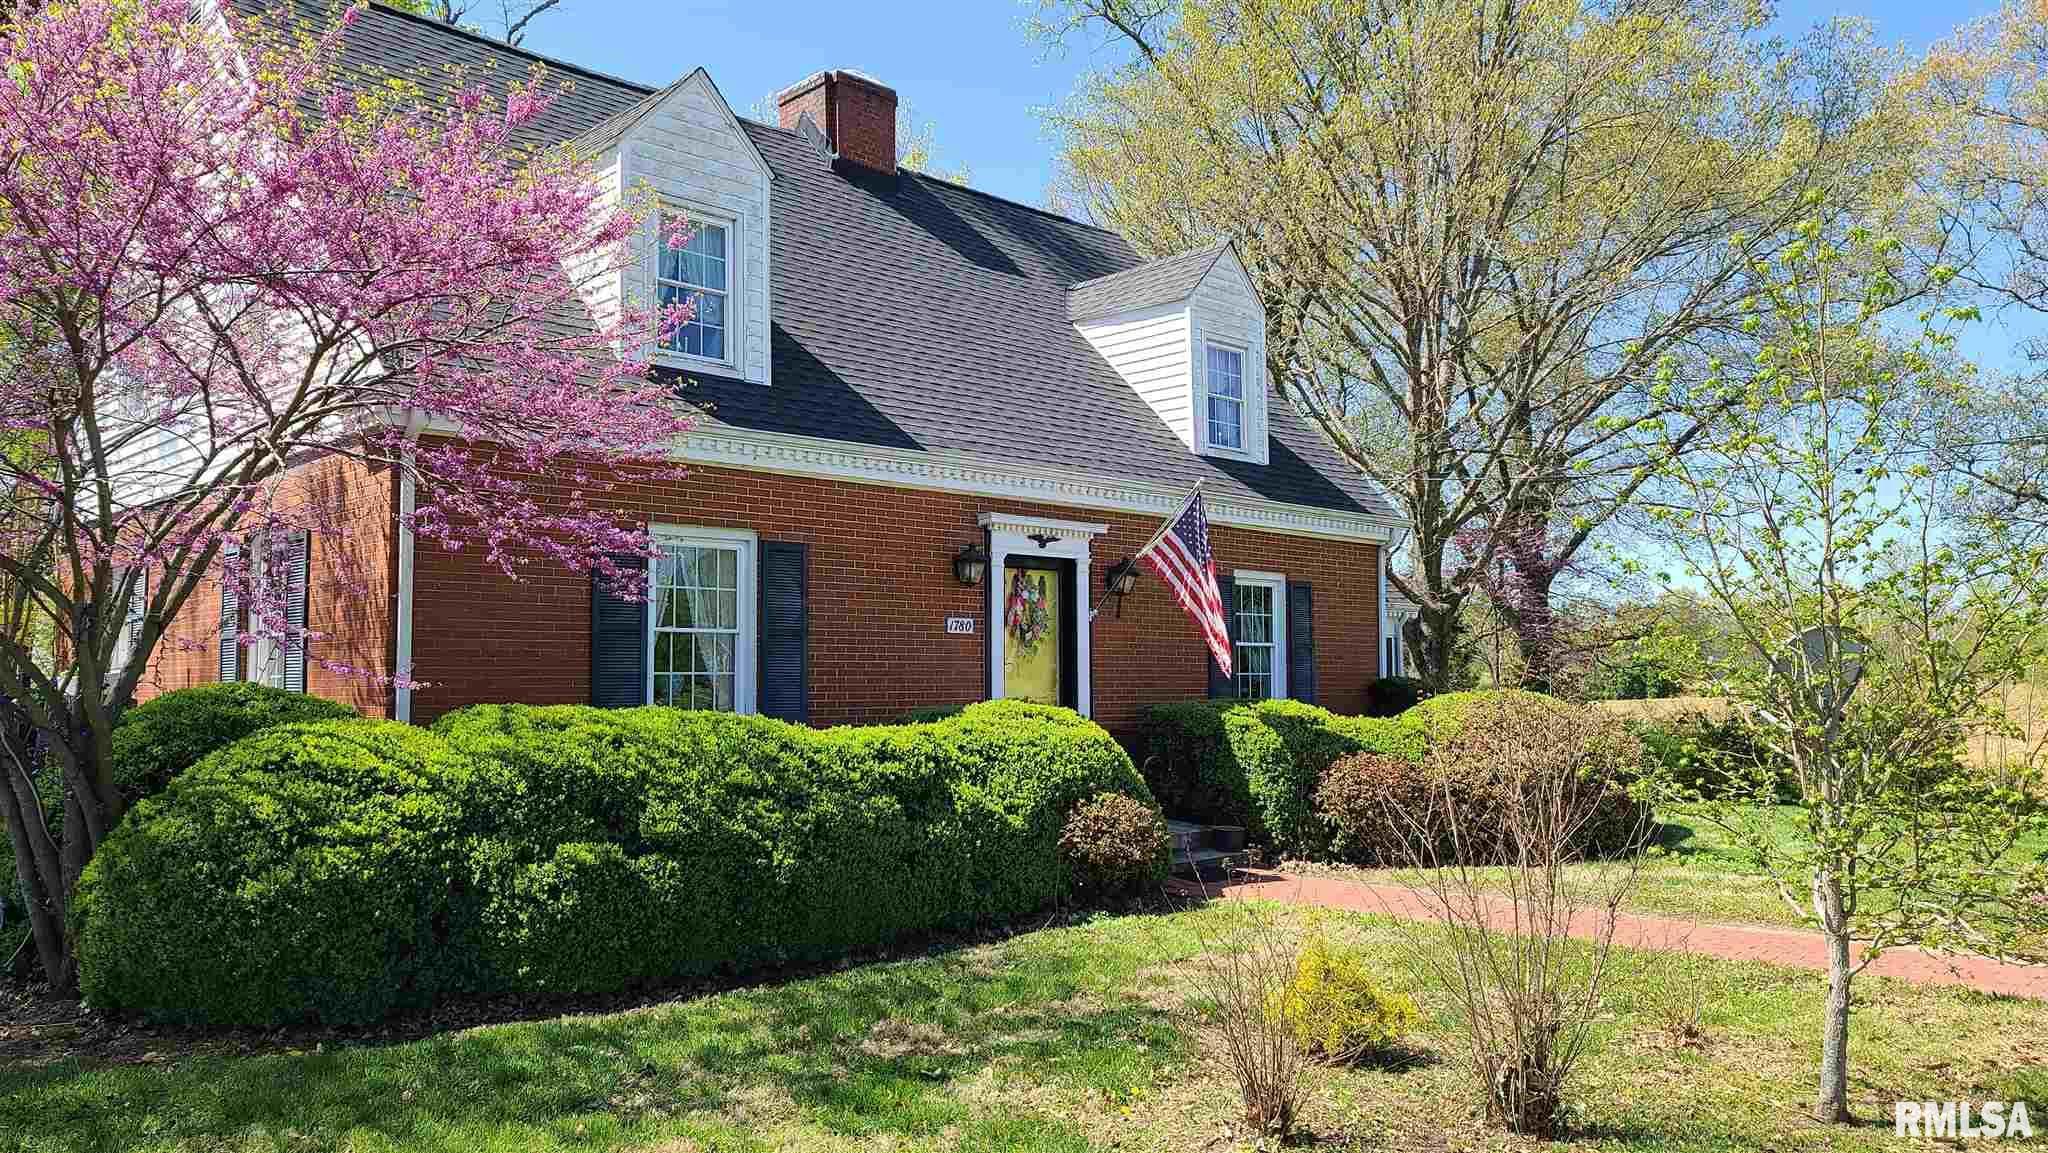 62977 Real Estate Listings Main Image